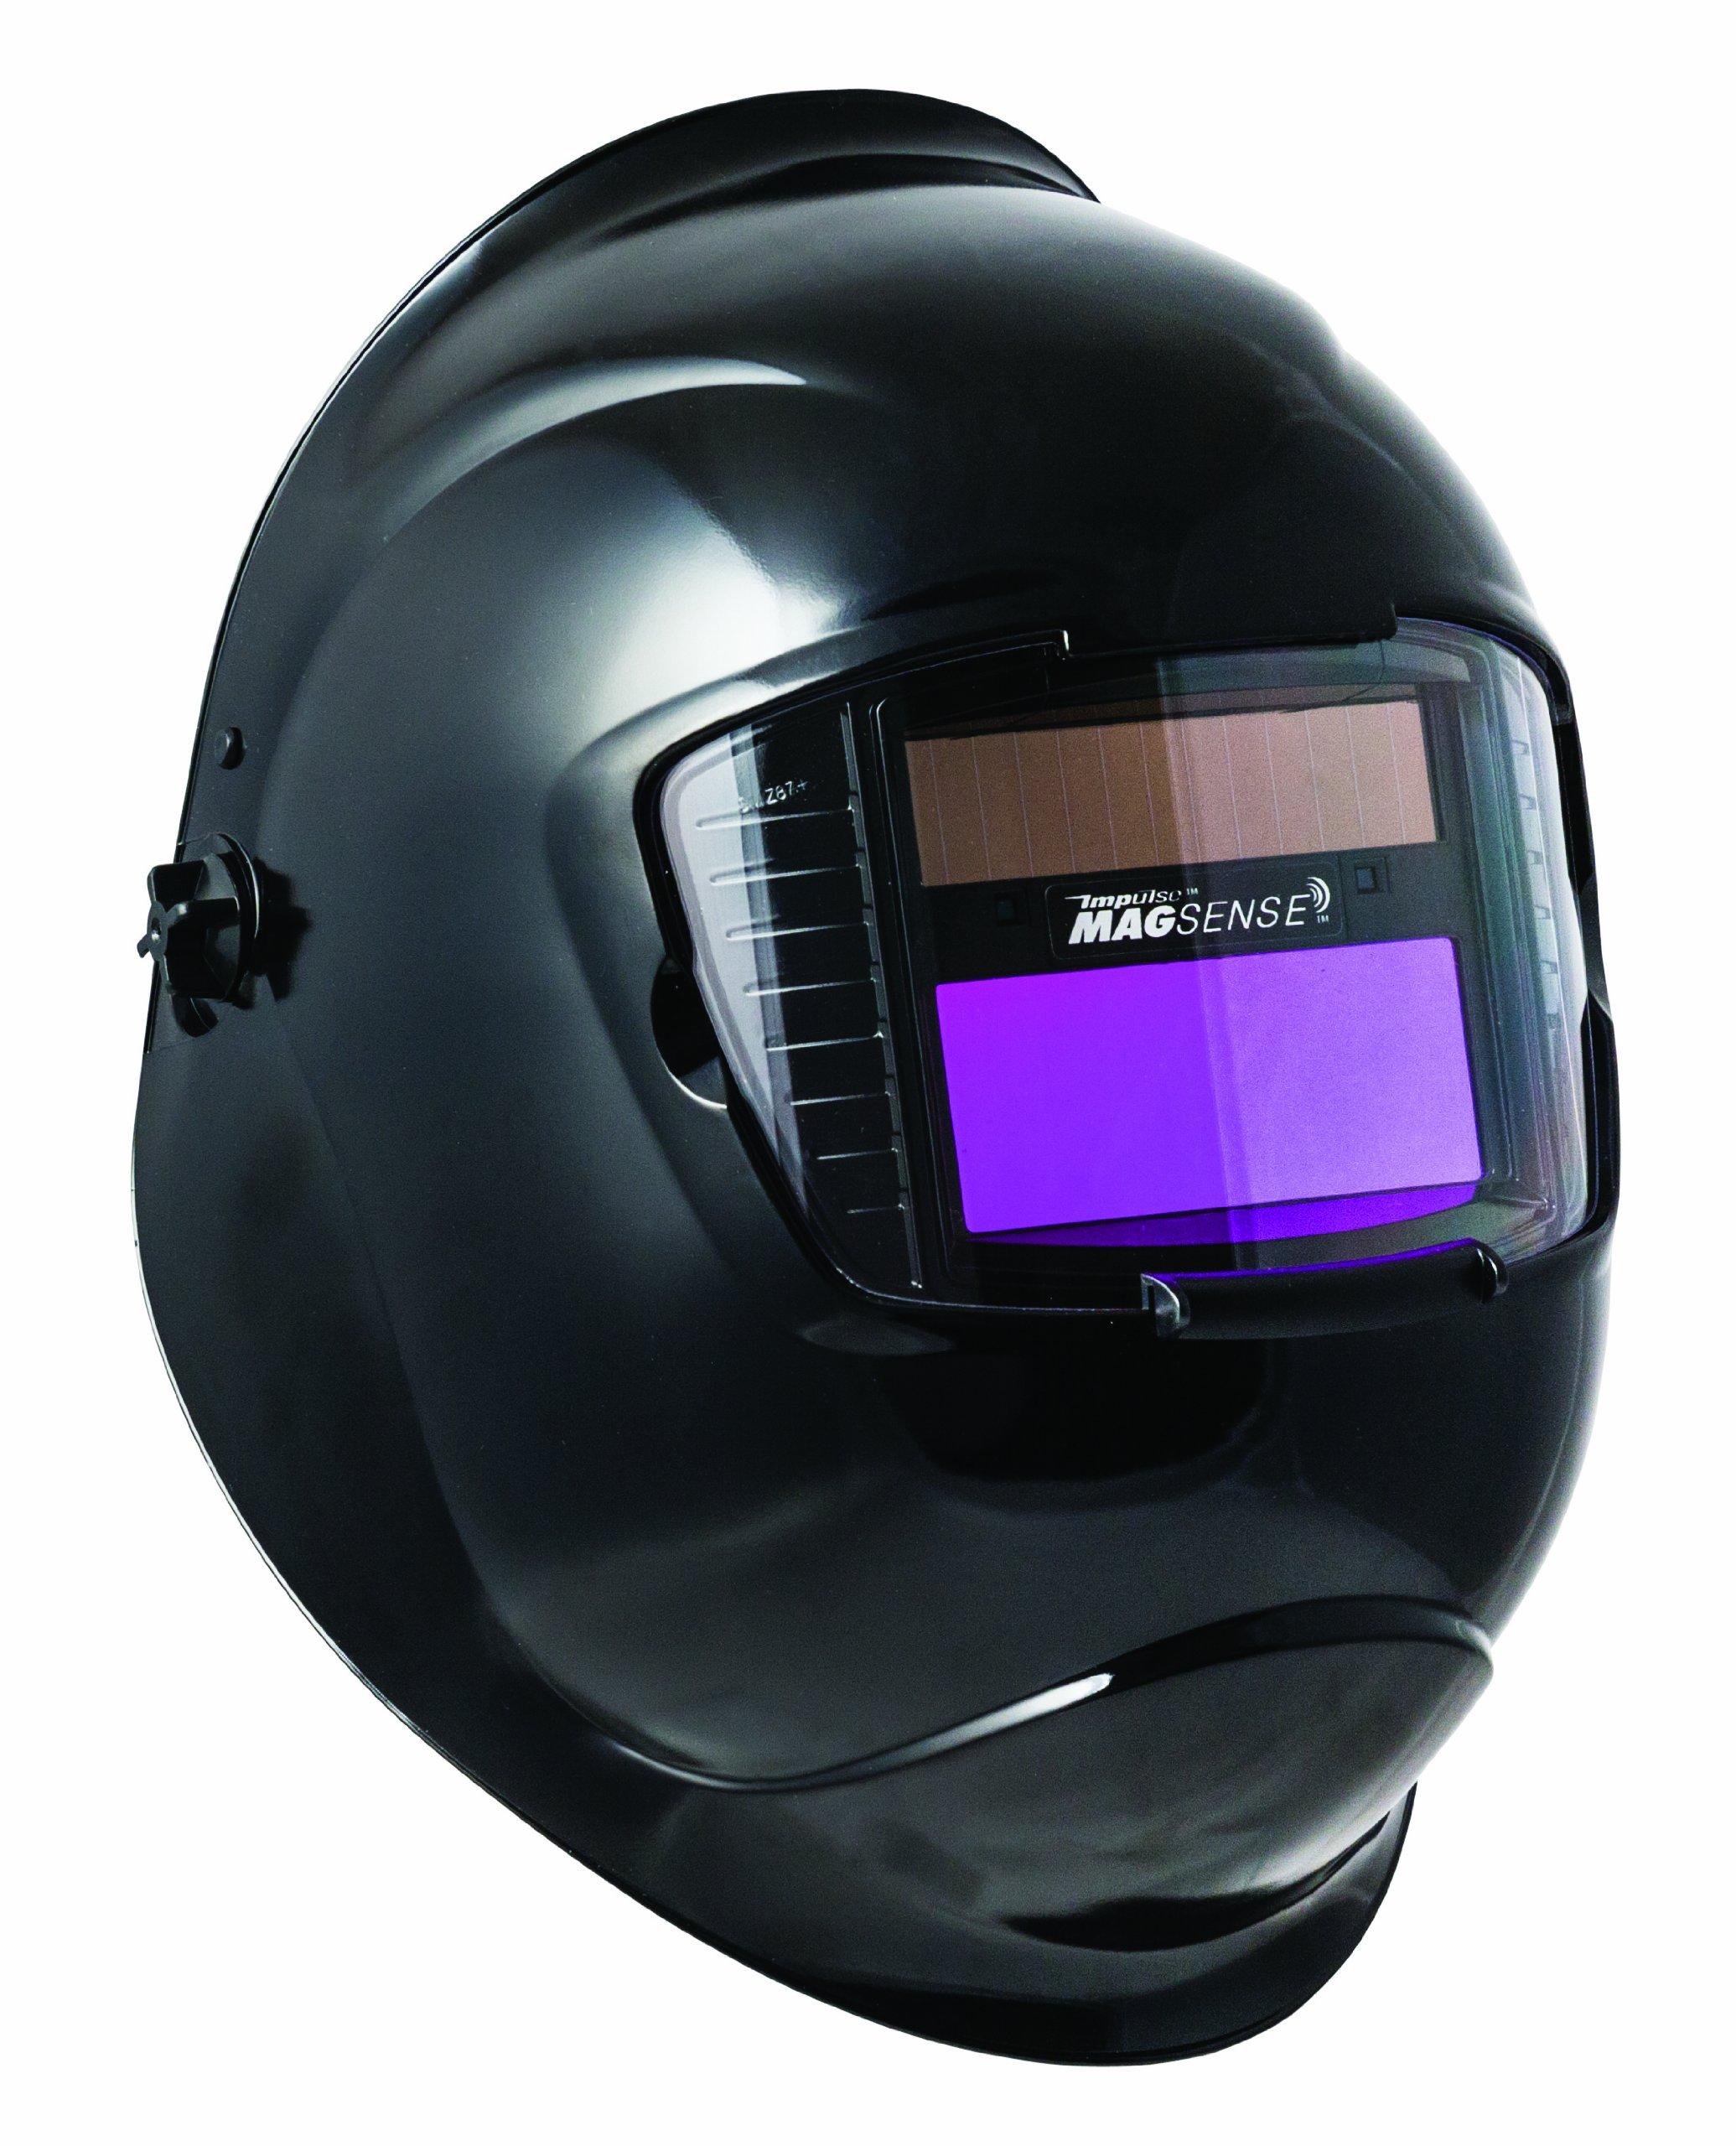 Sellstrom 41300-611 Galaxy Welding Helmet with 27611 Variable Shade,  9-13 Auto-Darkening Filter, 90 x 110 mm, Black